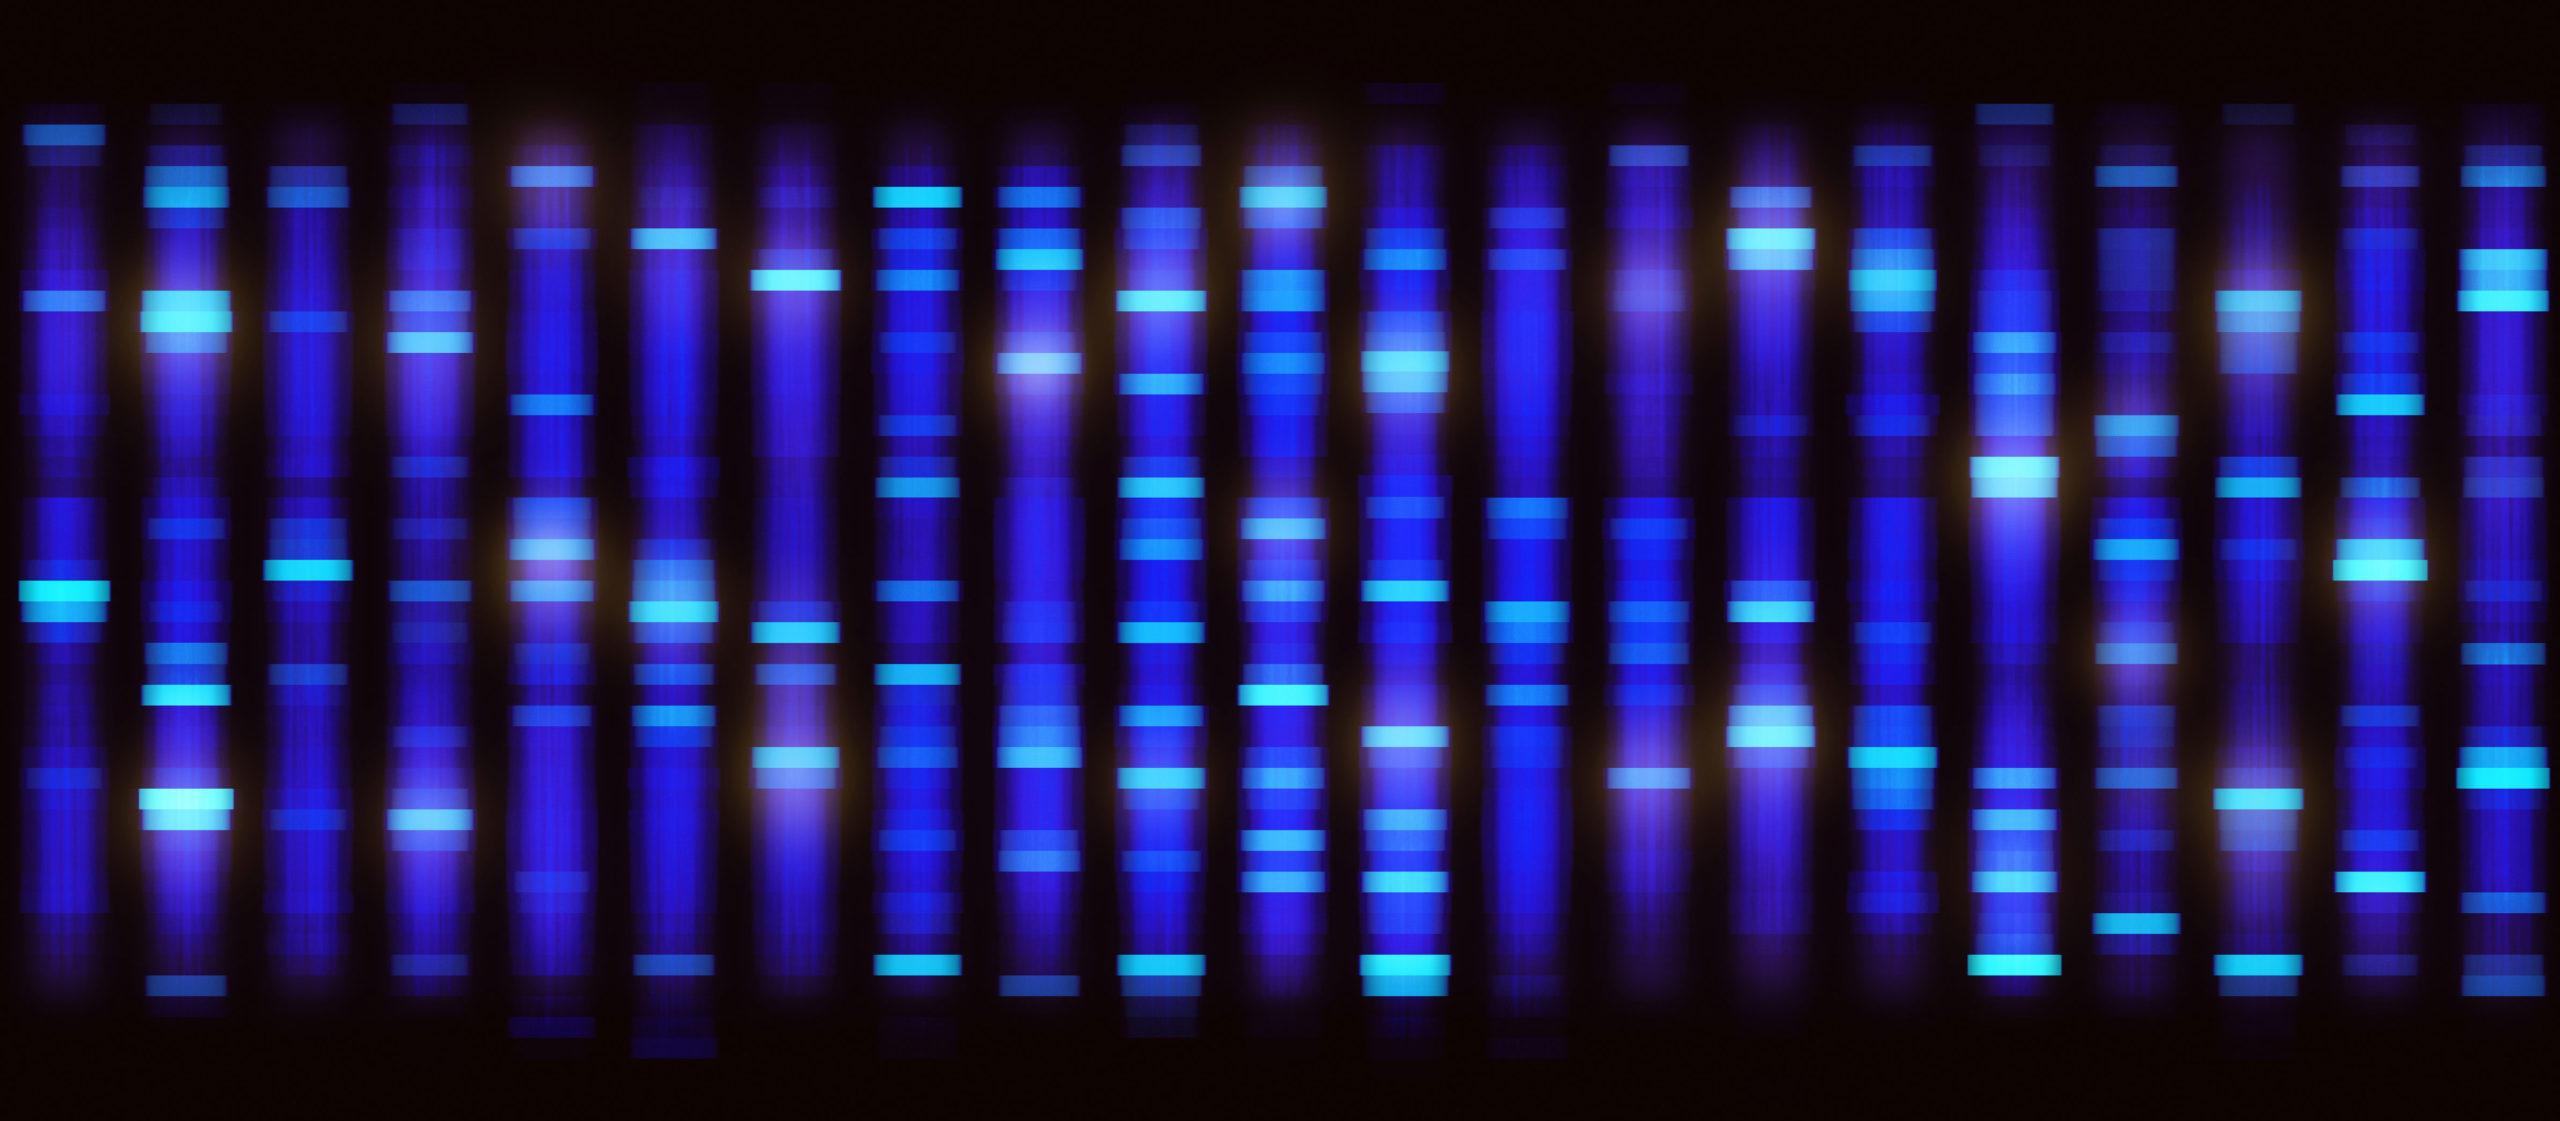 Gene sequencing data, blue on black.